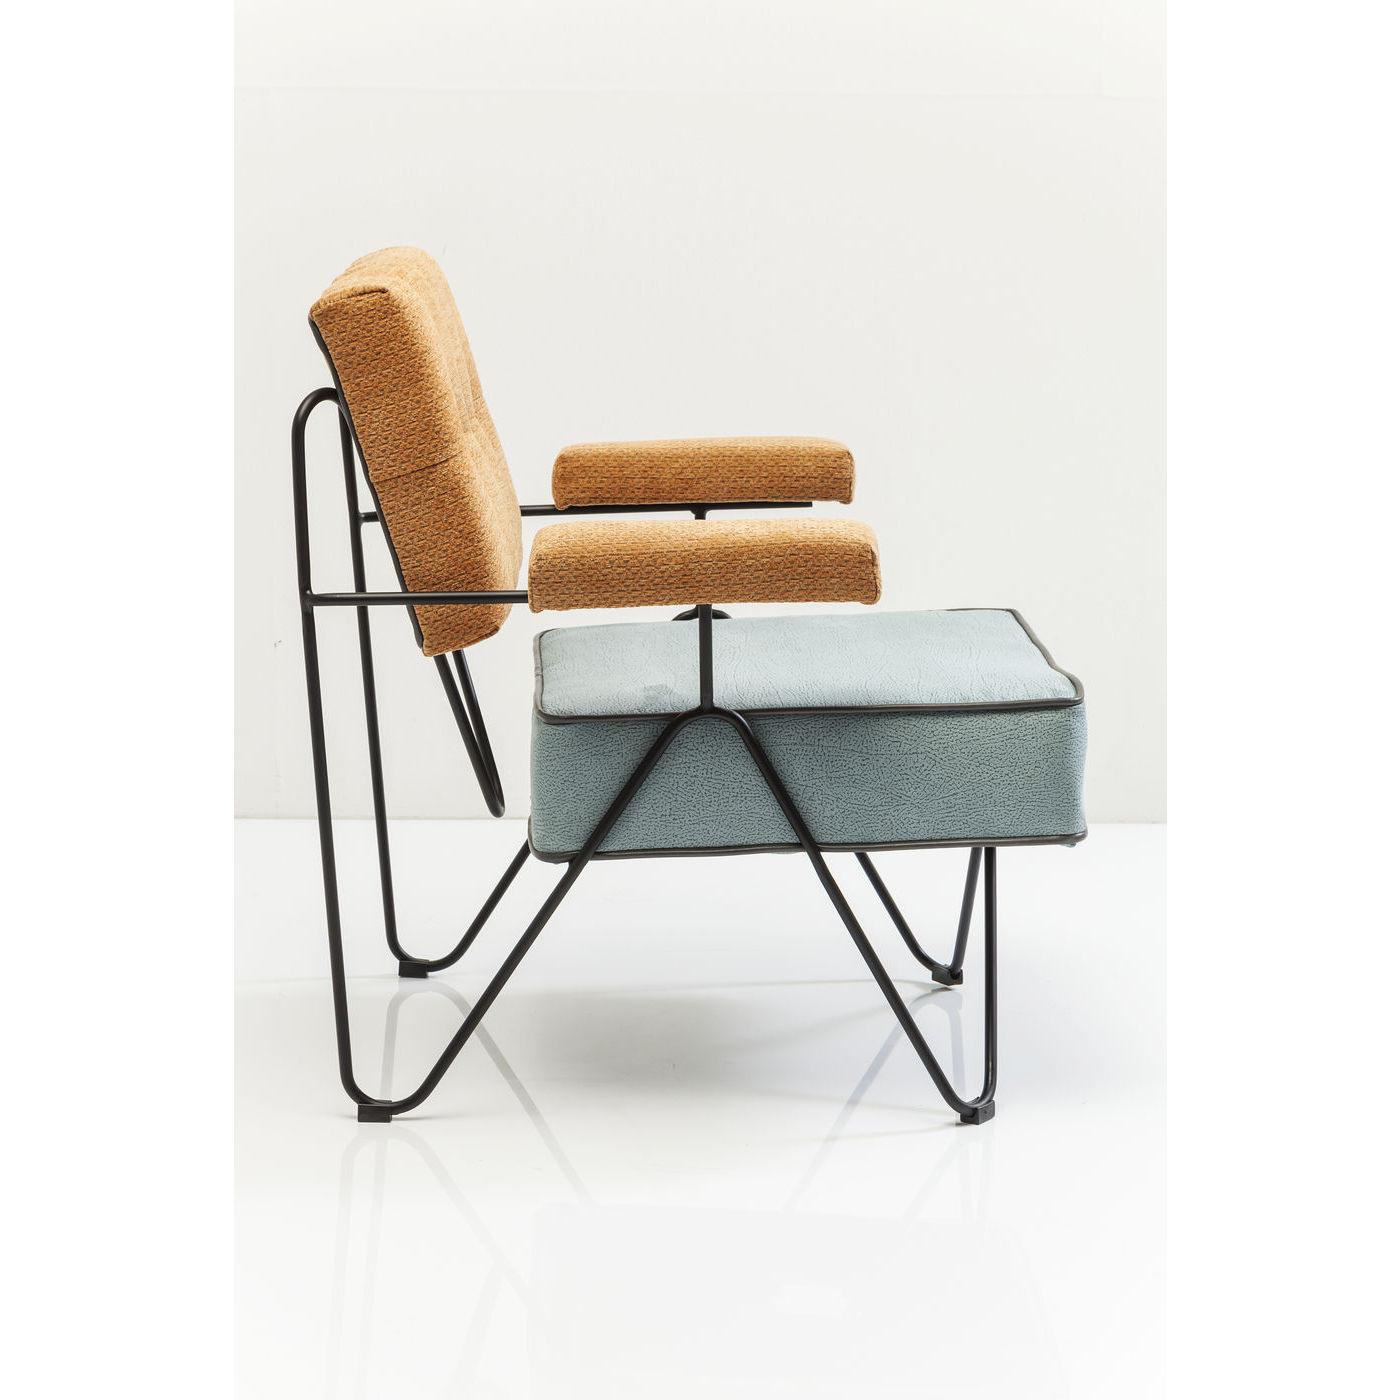 sessel polstersessel relaxsessel cocktailsessel malm triangle neu kare design ebay. Black Bedroom Furniture Sets. Home Design Ideas